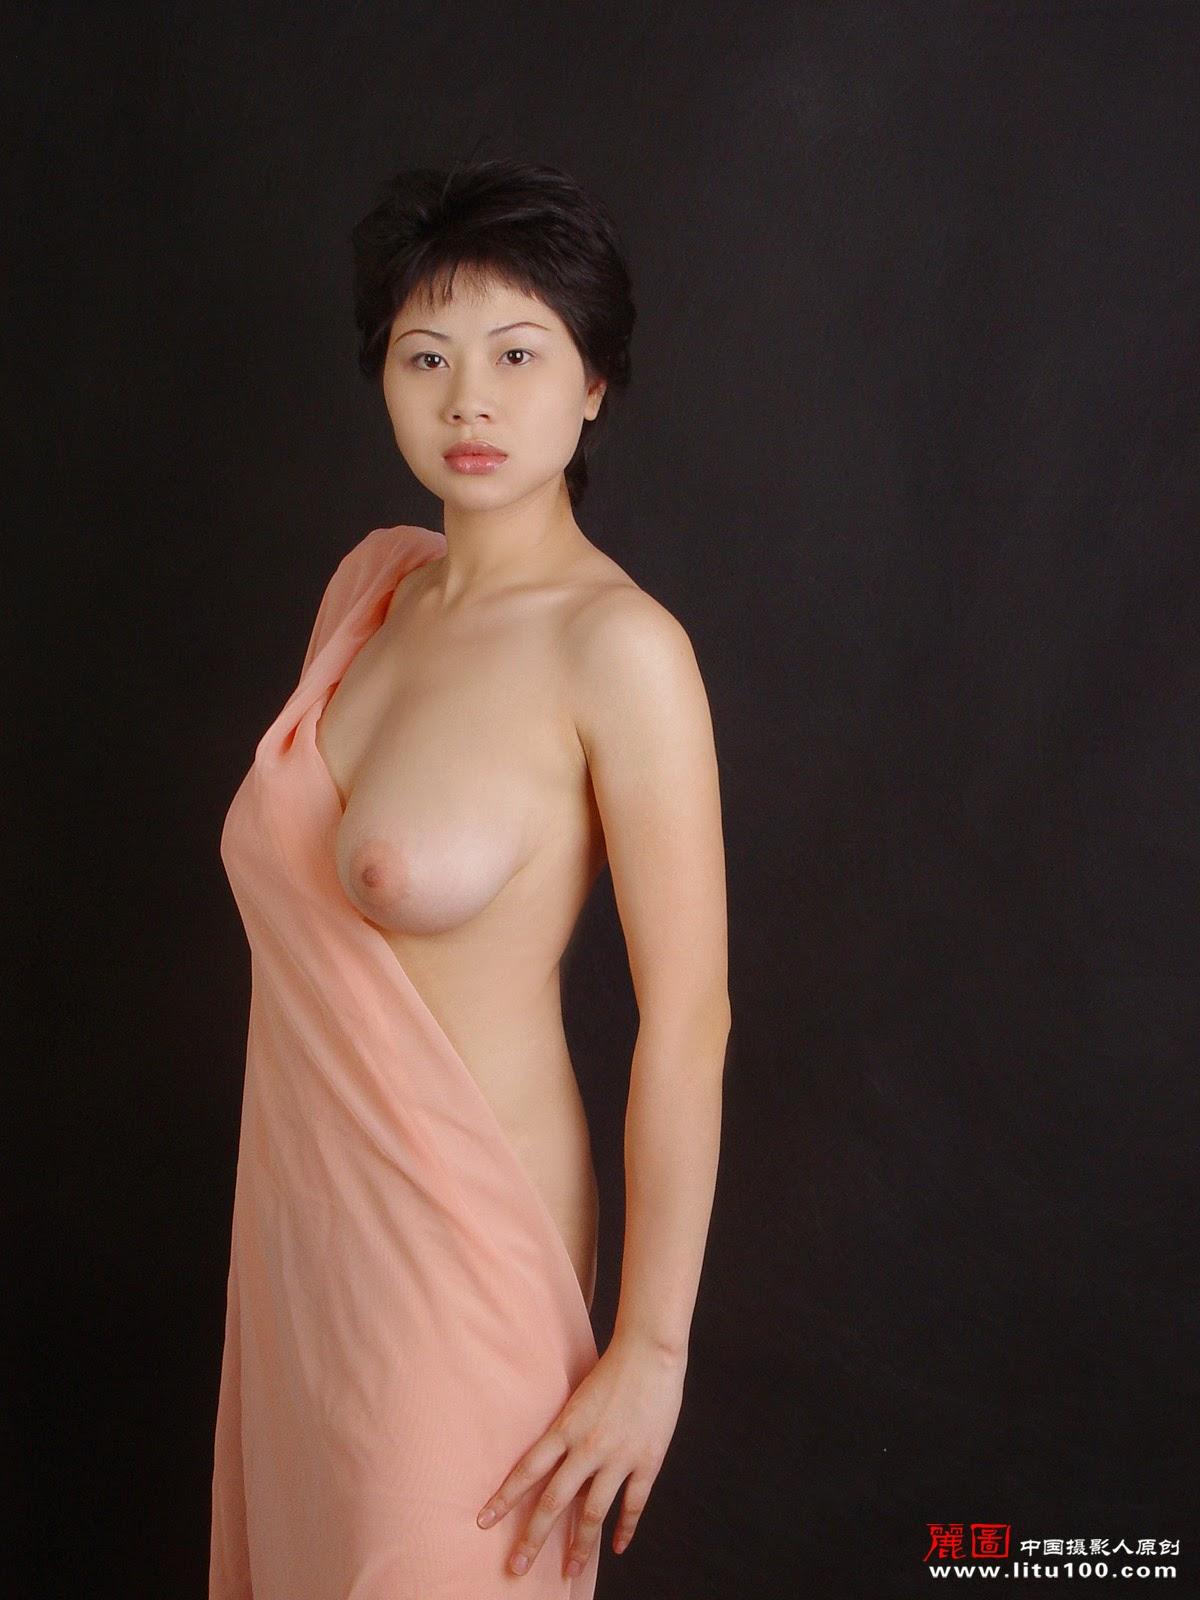 Chinese nudeModel ShanShan Get link; Facebook; Twitter; Pinterest; Google+; Email. Chinese Nude Model  ...